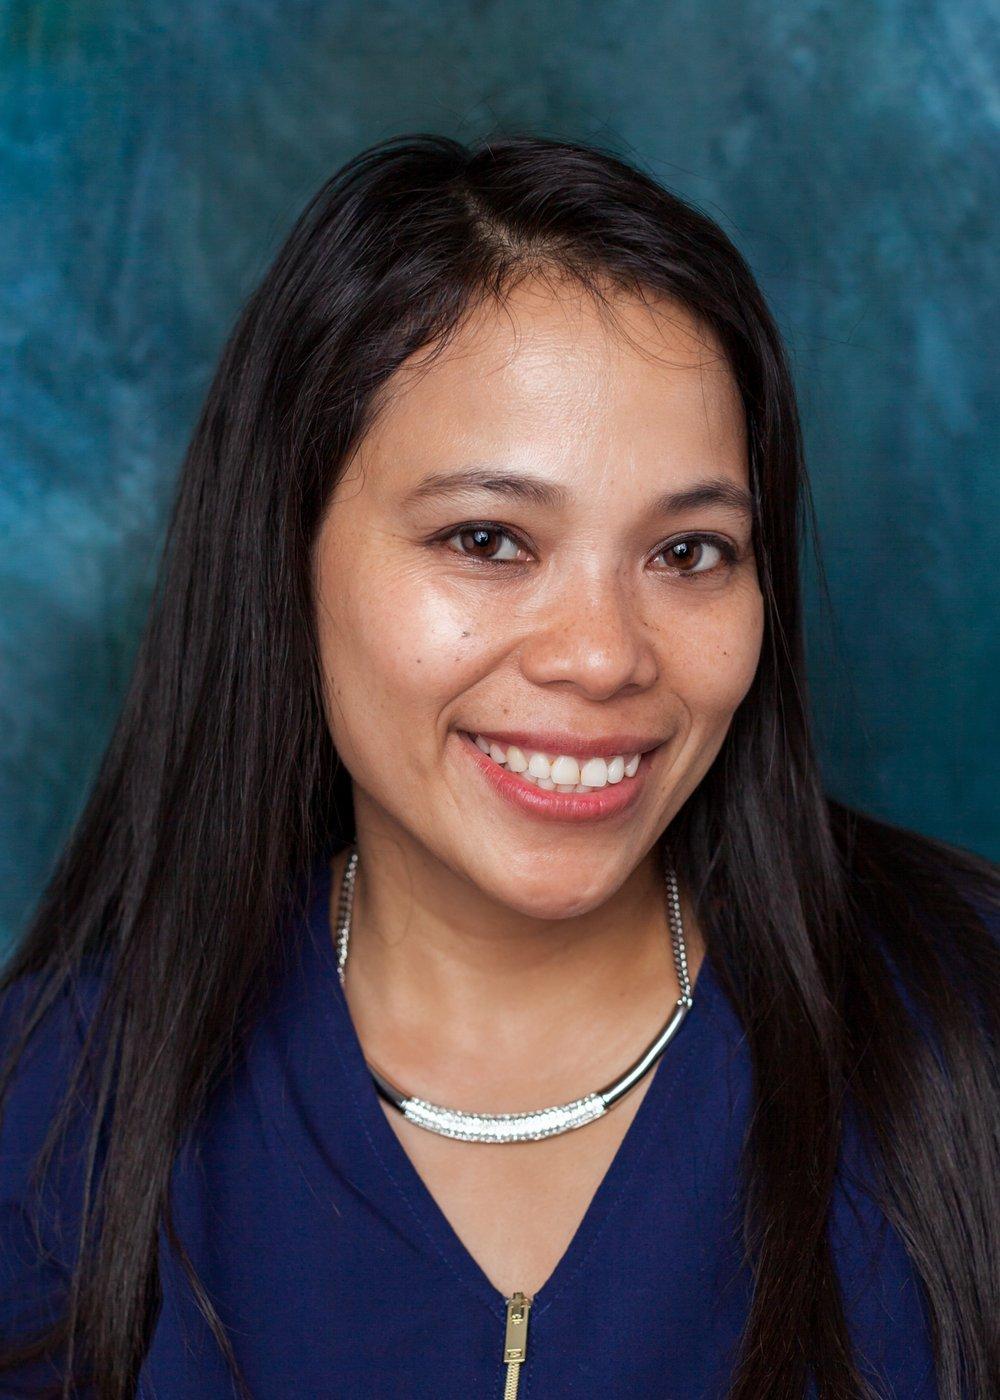 Ms. Catalina Tripathee